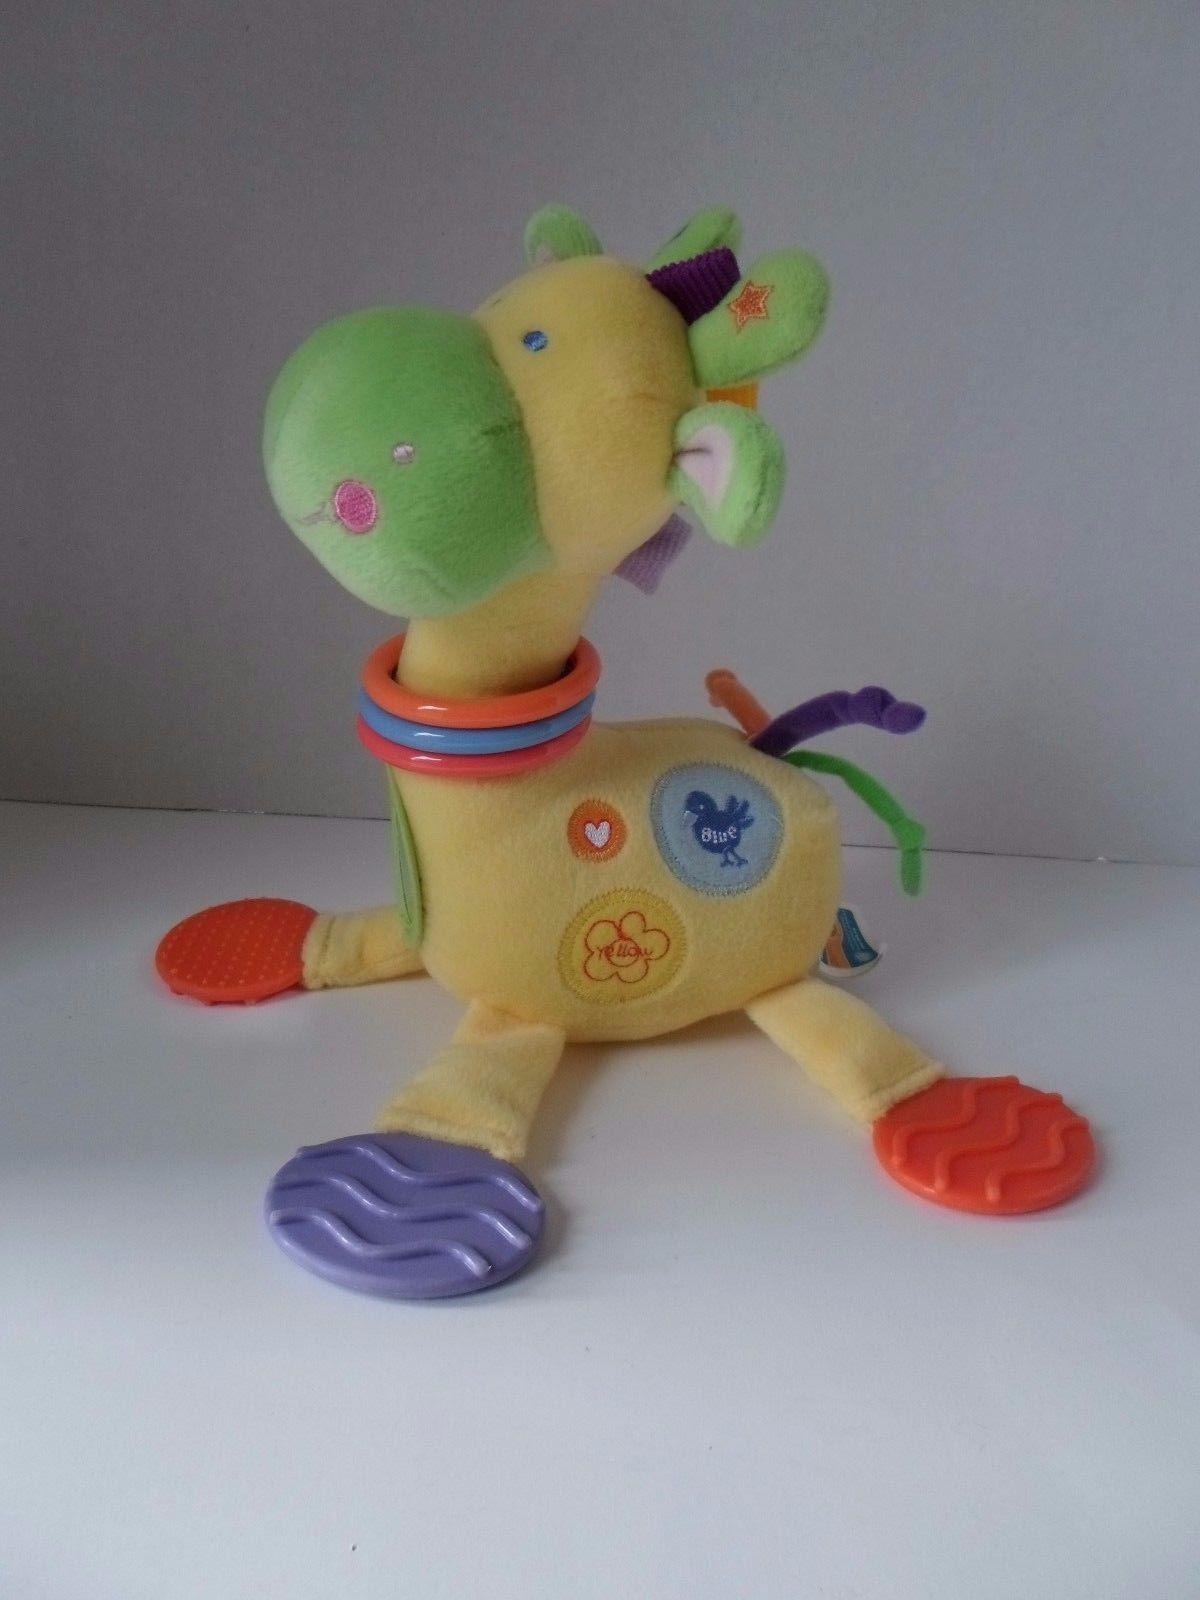 Kids Preferred Giraffe BABY Developmental Plush TOY Rattle Teether Mirror image 3